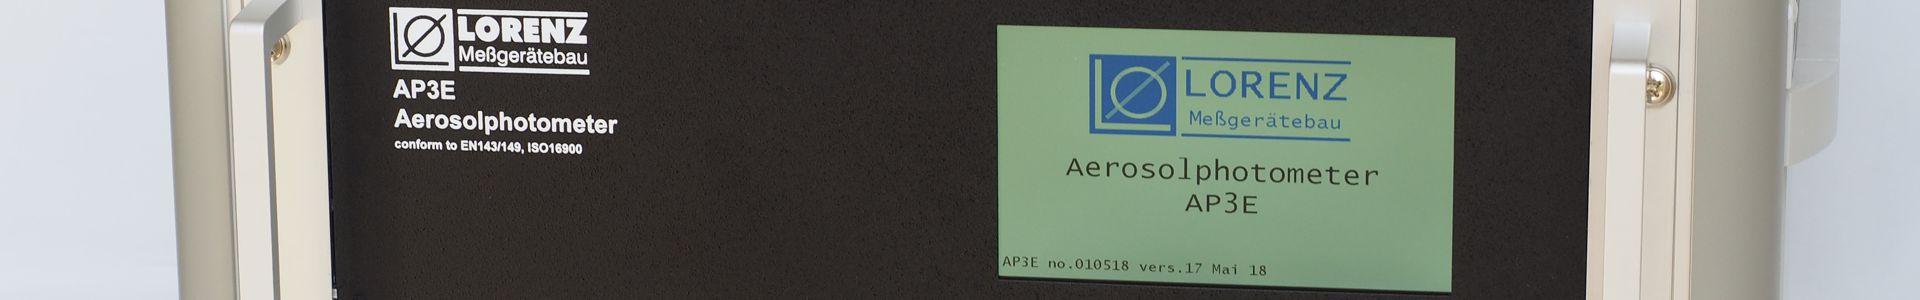 AP3E Aerosolphotometer